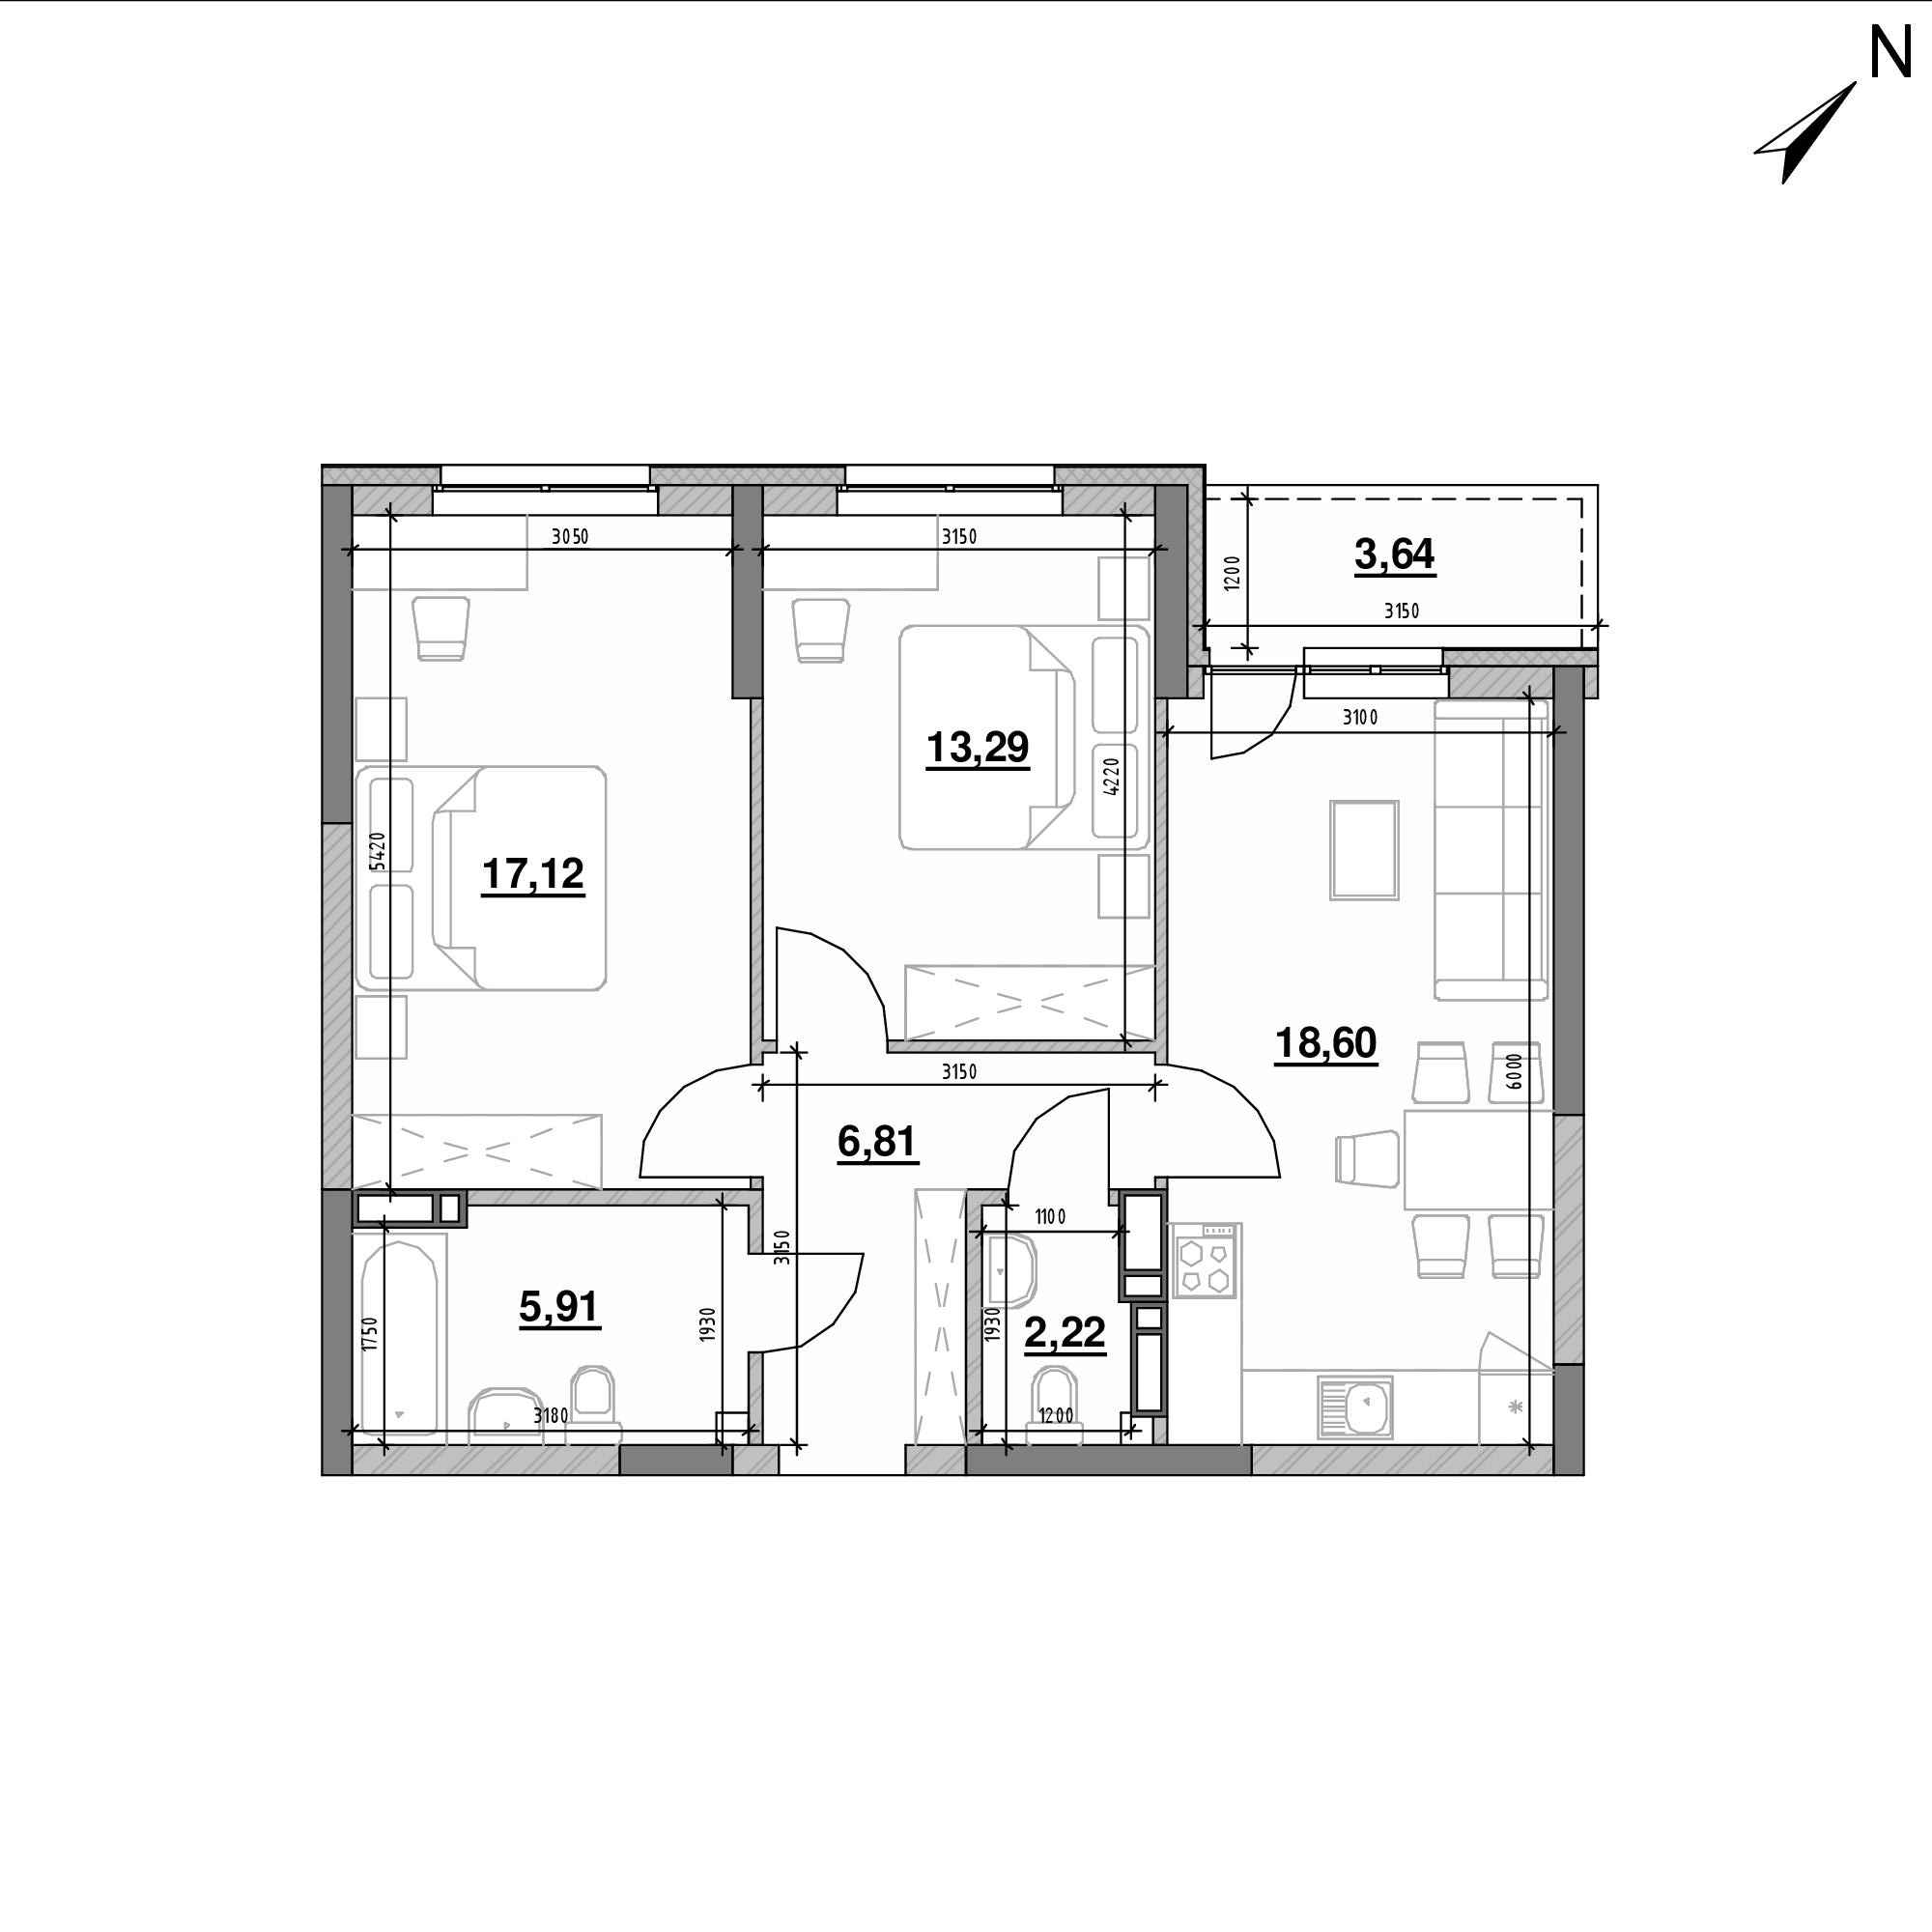 ЖК Оk'Land: планування 2-кімнатної квартири, №514, 67.59 м<sup>2</sup>